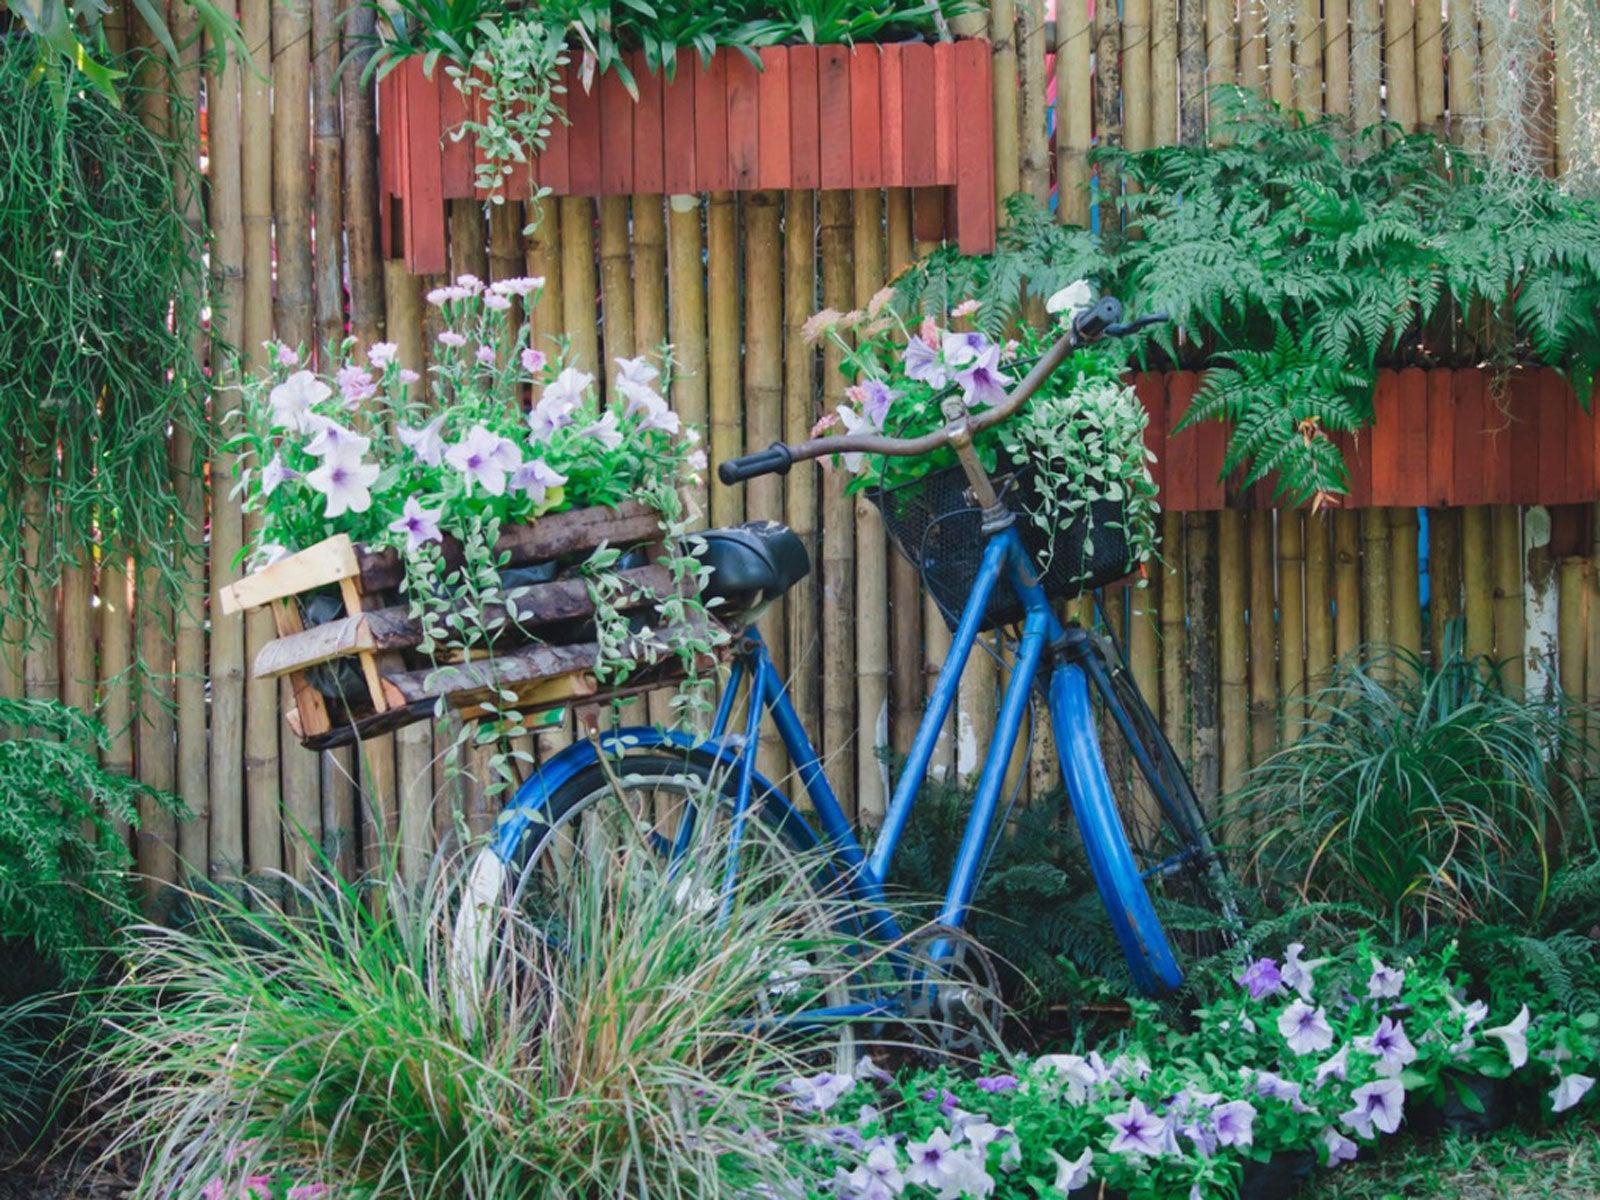 Junk Garden Ideas – Tips For Creating Attractive Junkyard Gardens